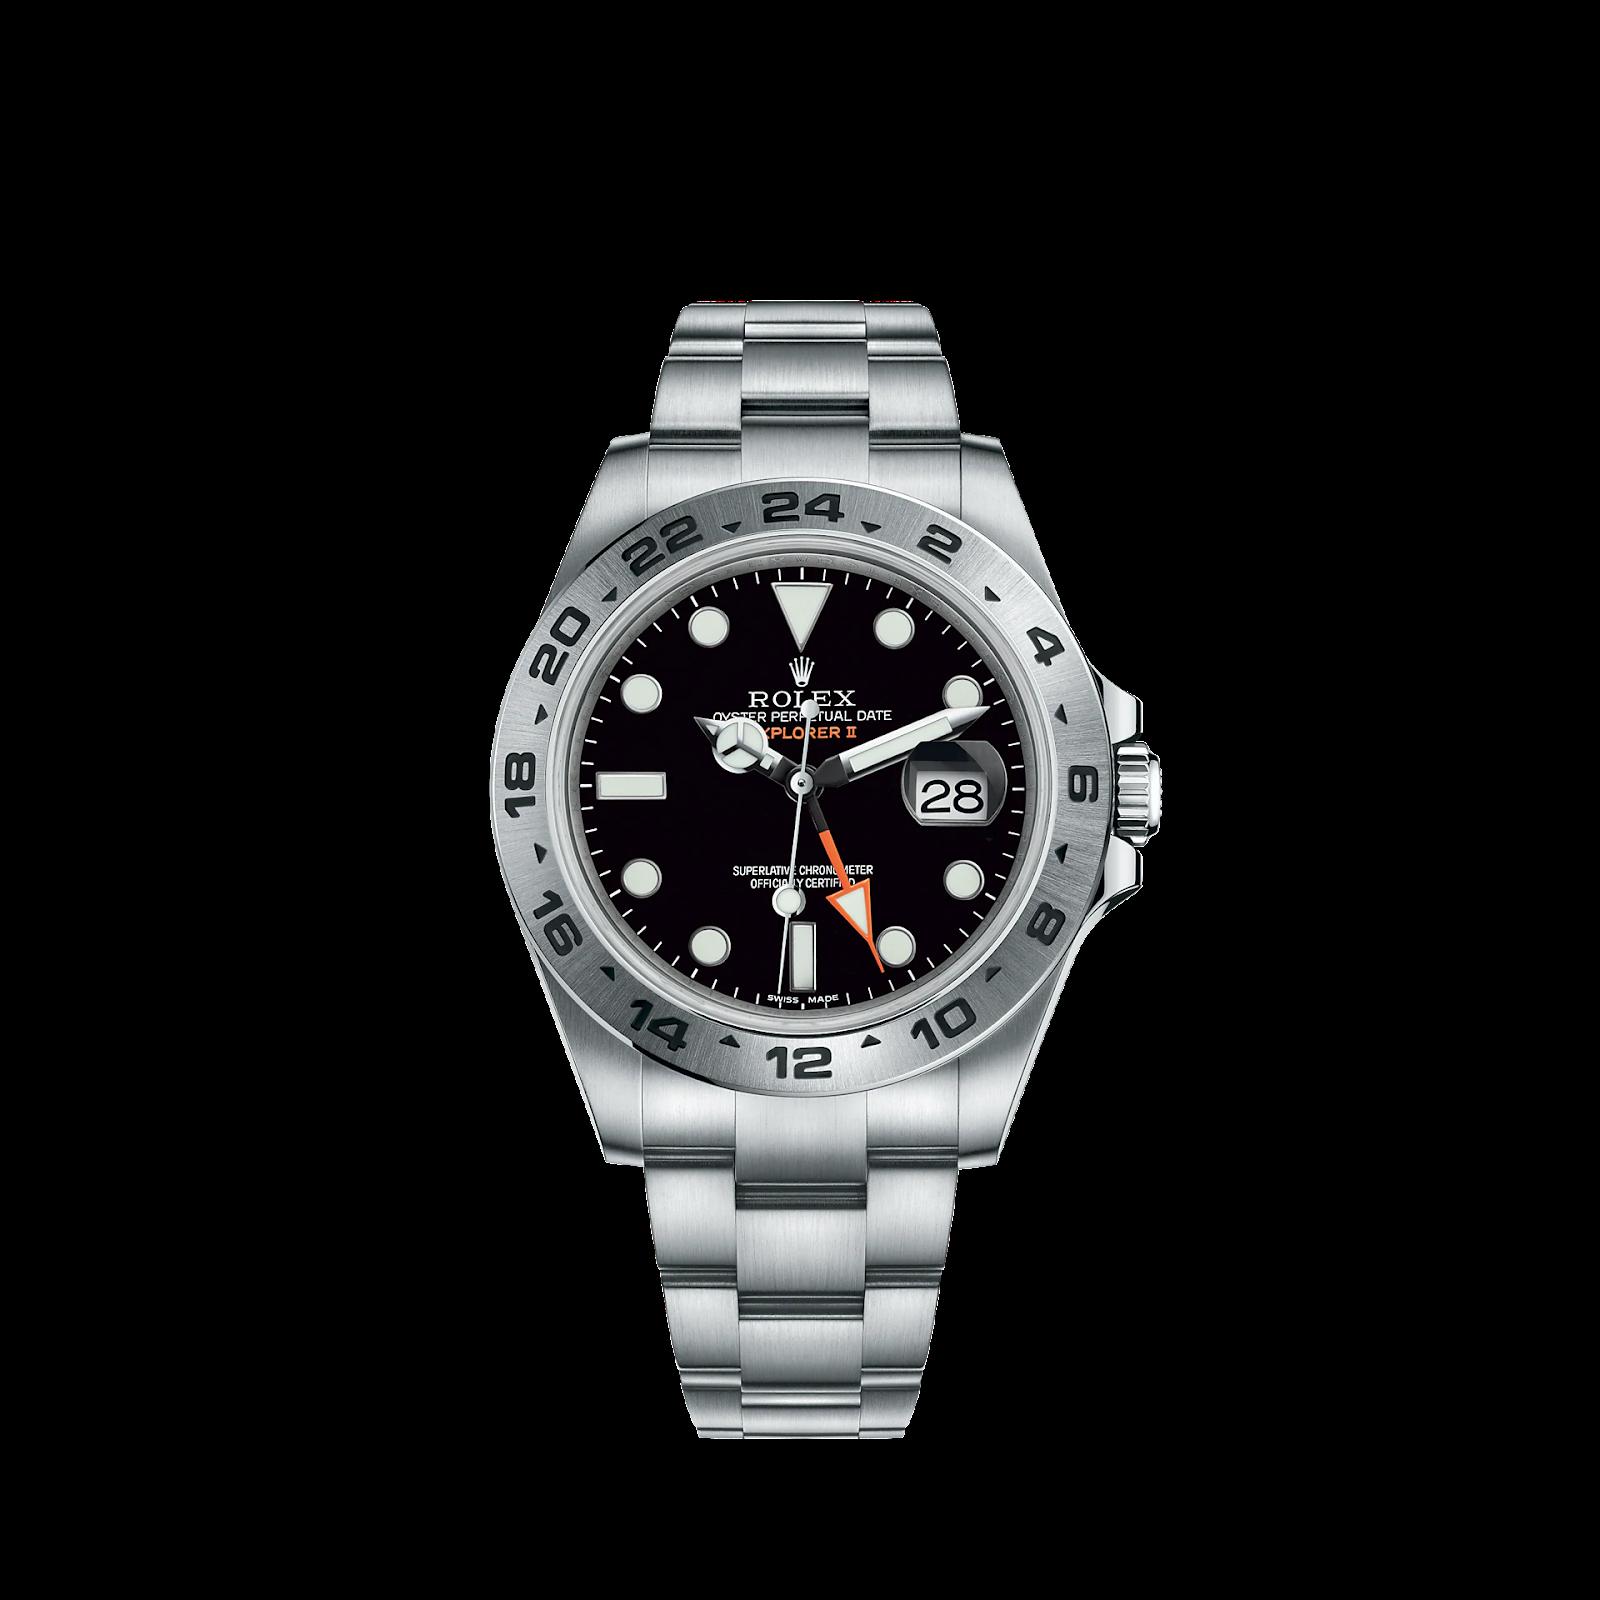 Rolex Explorer II Reference 216570 Price